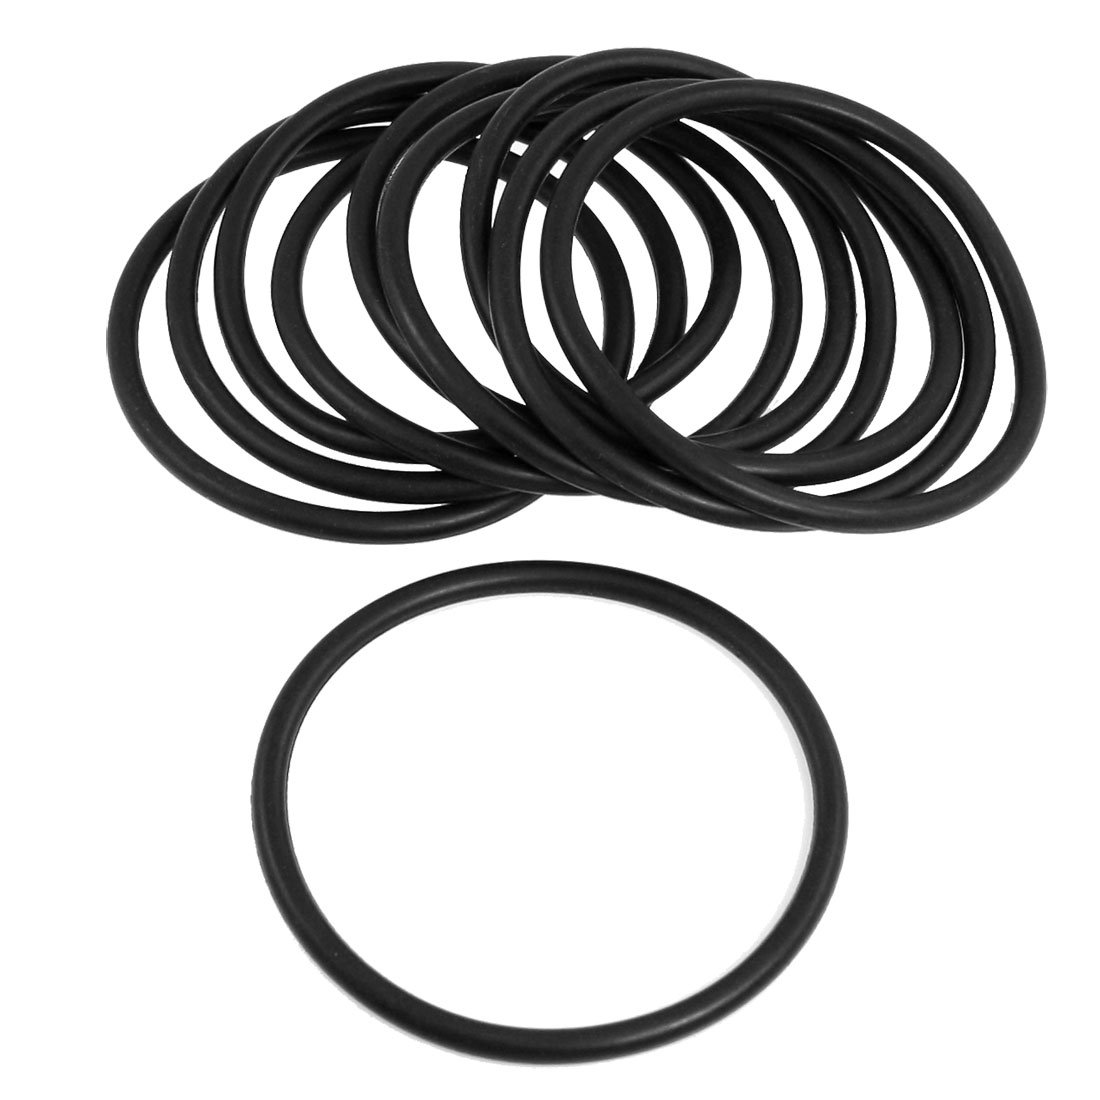 Sourcingmap a12040200ux0451-10 piezas de caucho nitrilo o nbr anillo de anillos de junta de 80 mm x 5 mm